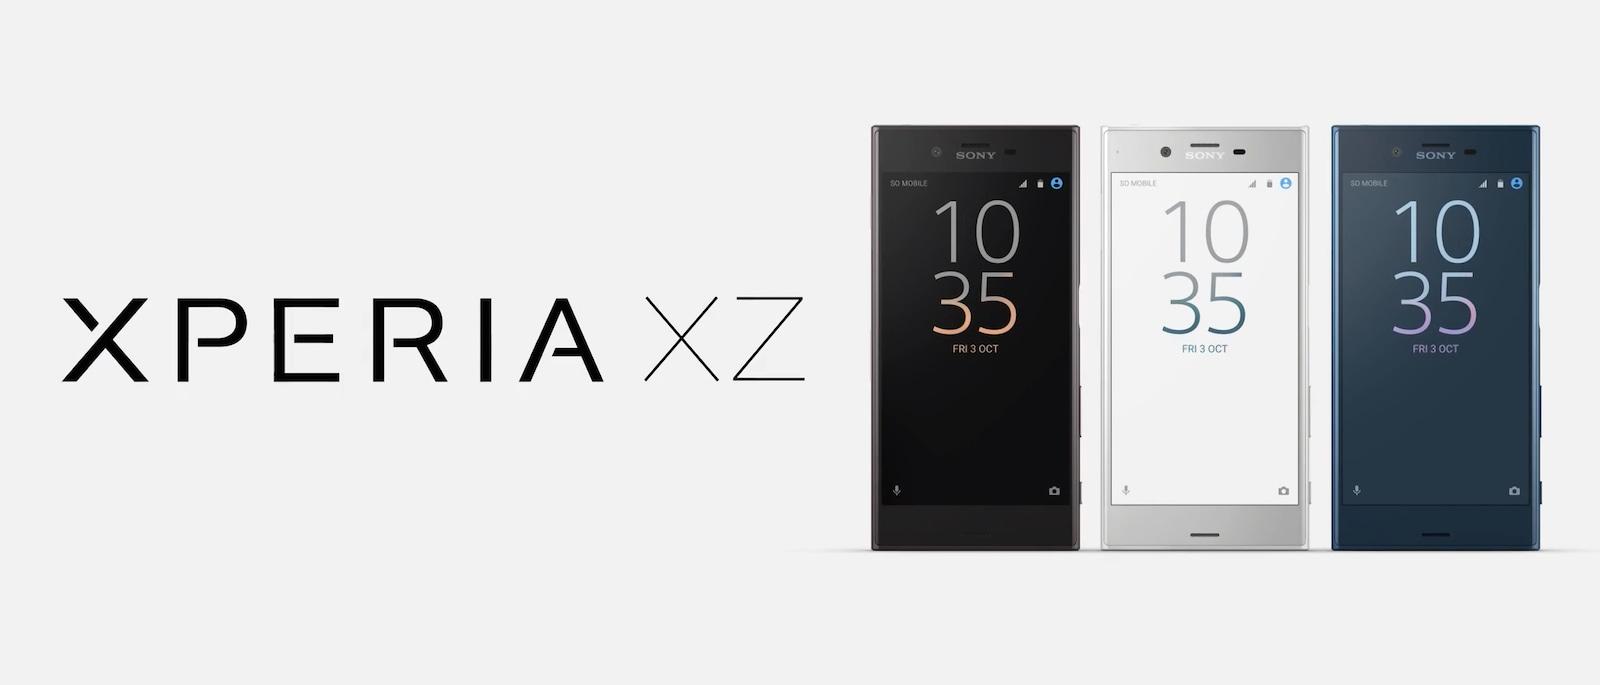 xperia-xz-logo-and-image.jpg